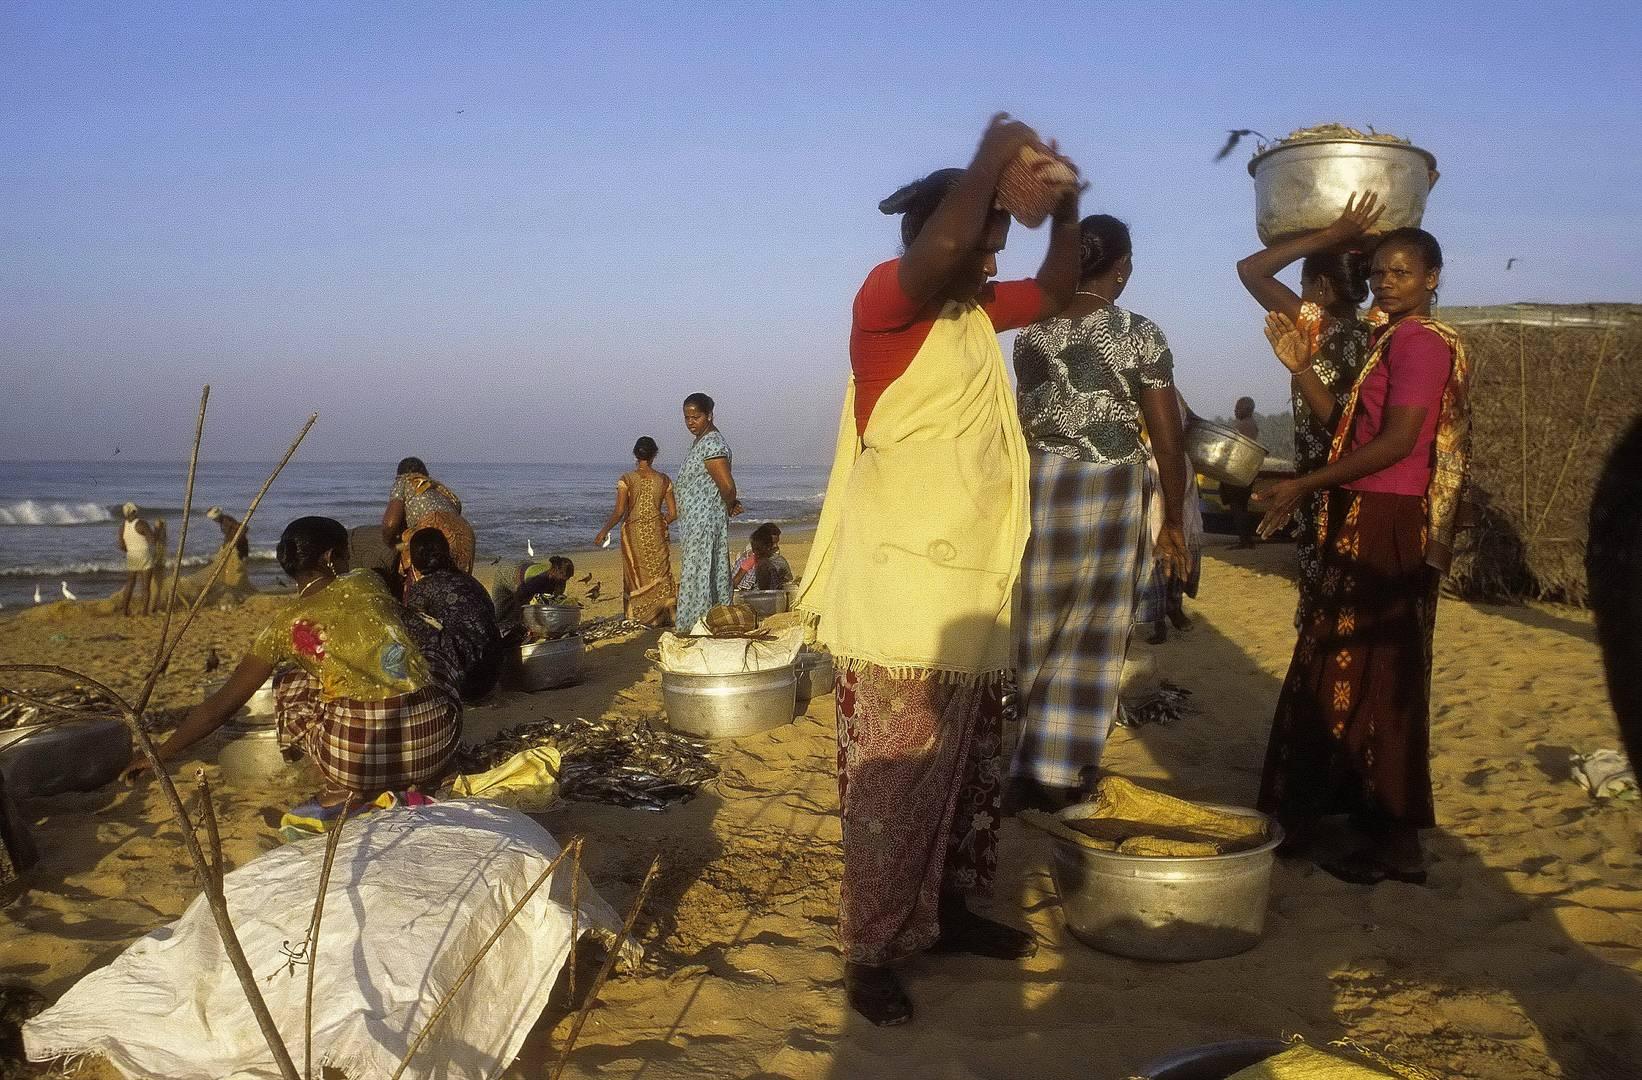 Fischerfrauen in Kerala - analog